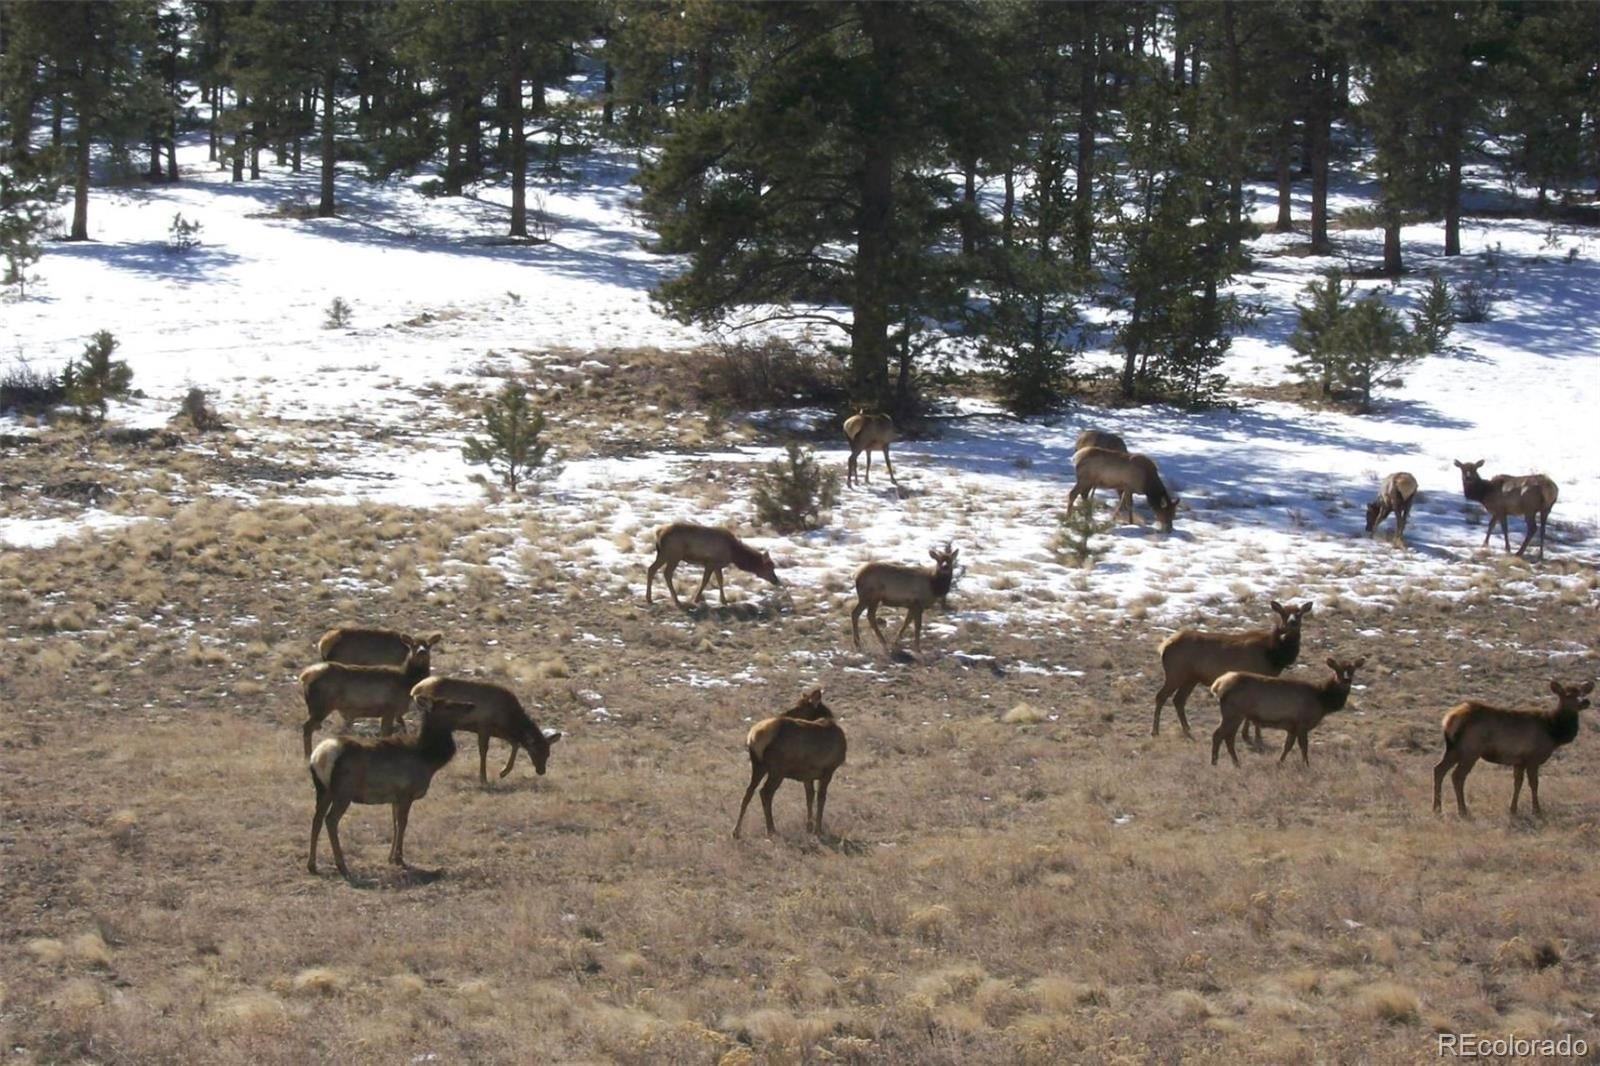 MLS# 8182693 - 36 - 396 Eagle Nest Trail, Guffey, CO 80820